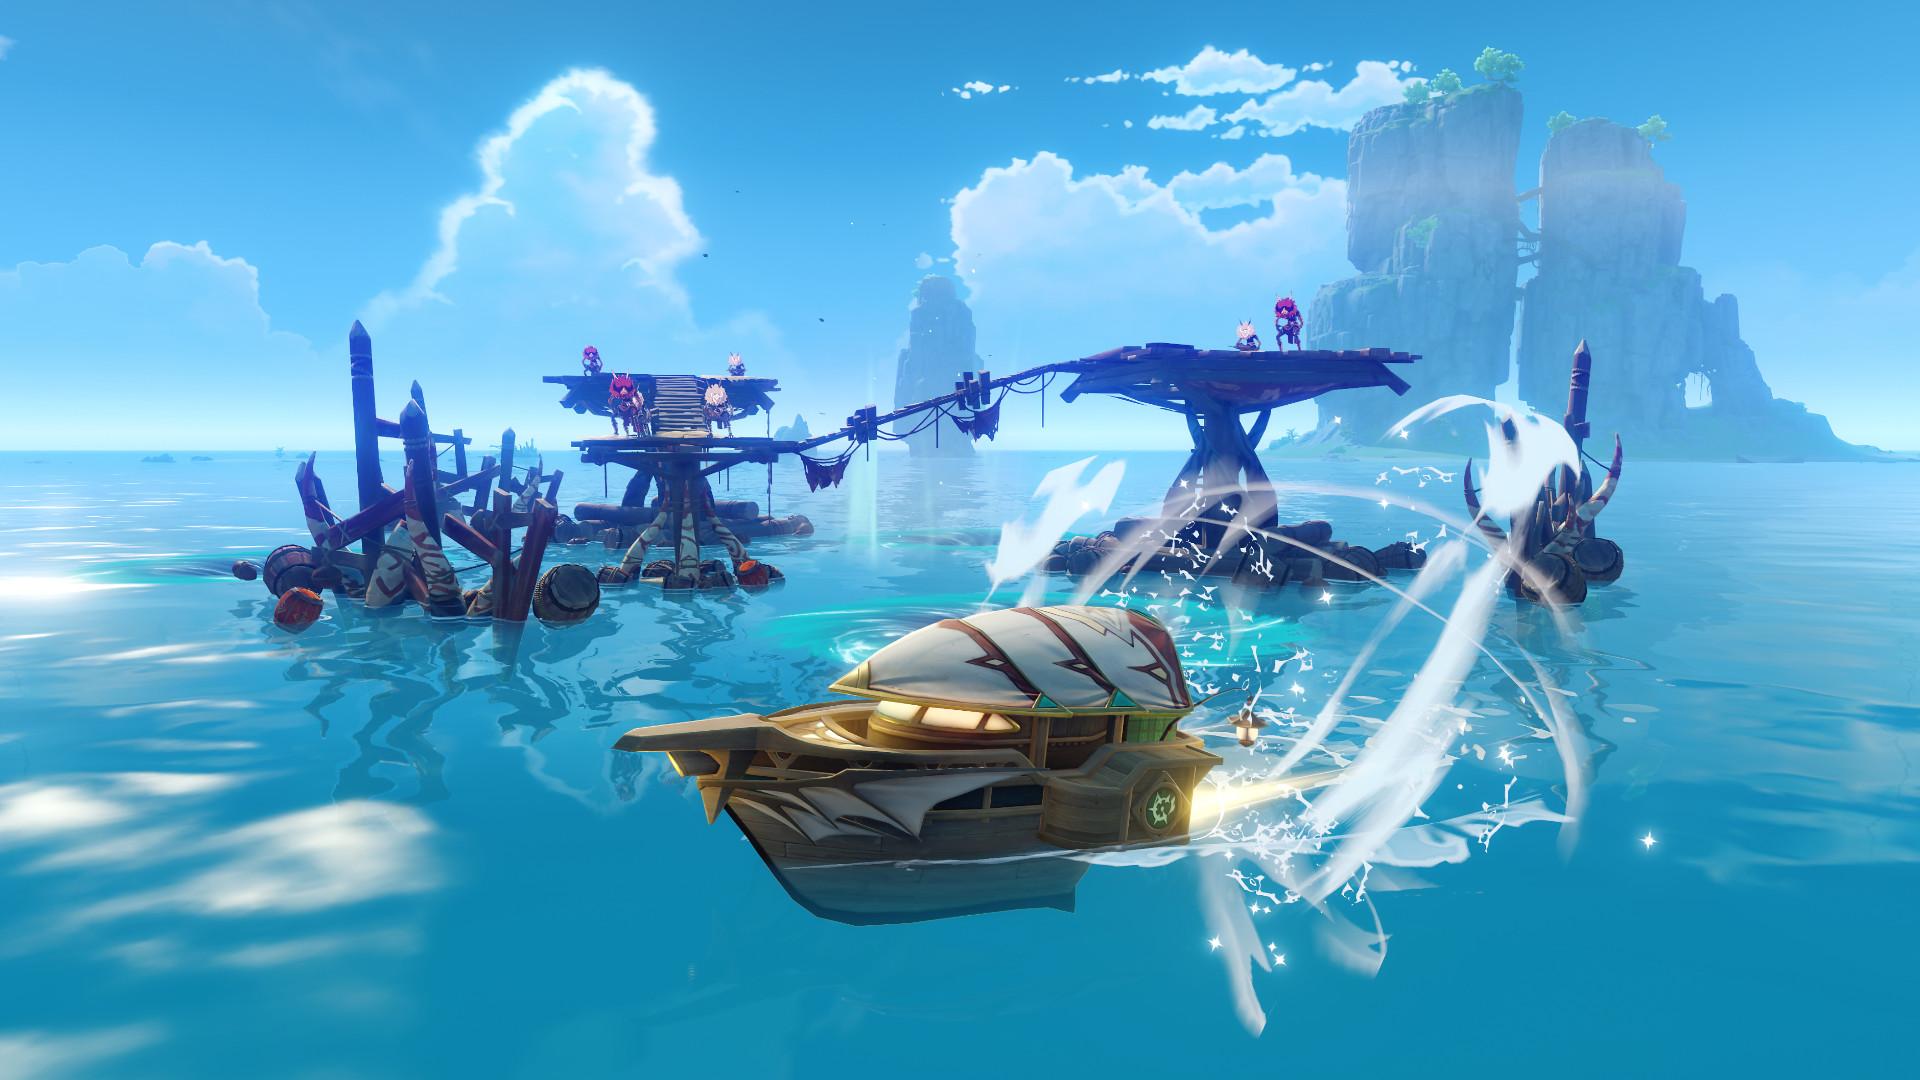 Genshin Impact isn't just Zelda: Breath of the Wild anymore – now it's Wind Waker